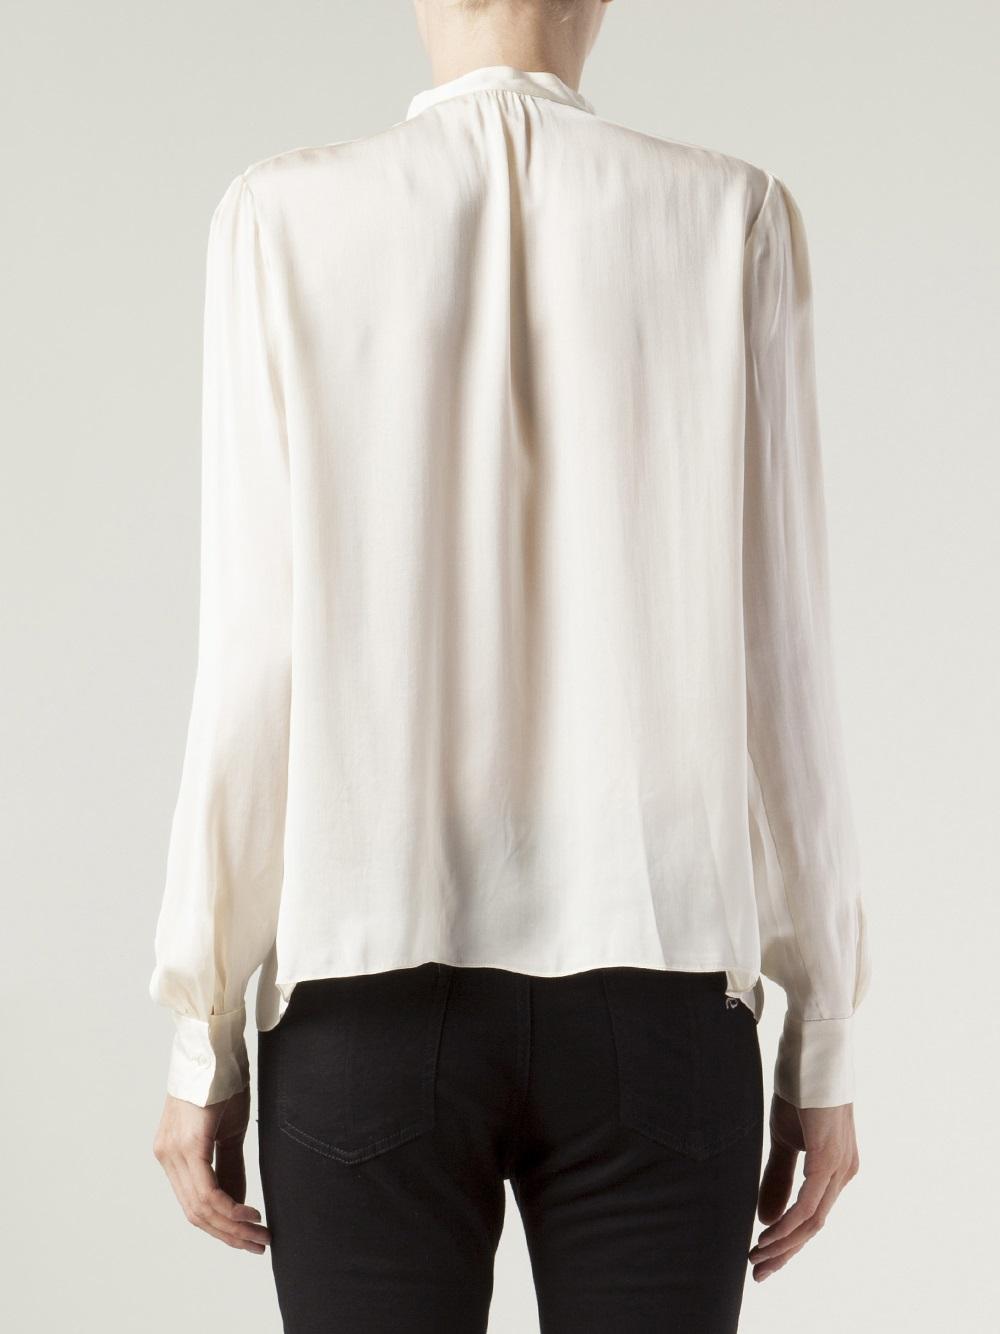 Long White Tunic Blouse